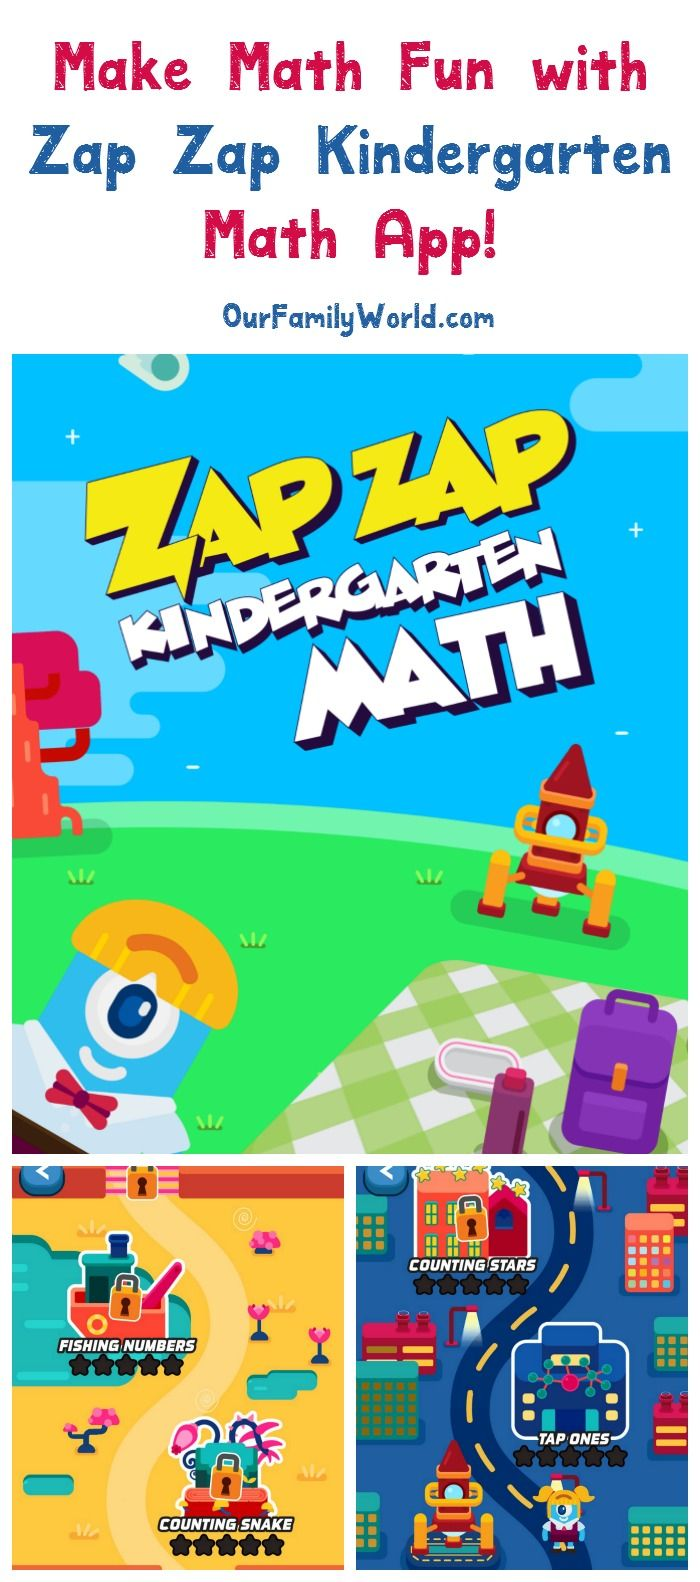 Zap Zap Kindergarten Math App Review for Kids - OurFamilyWorld ...